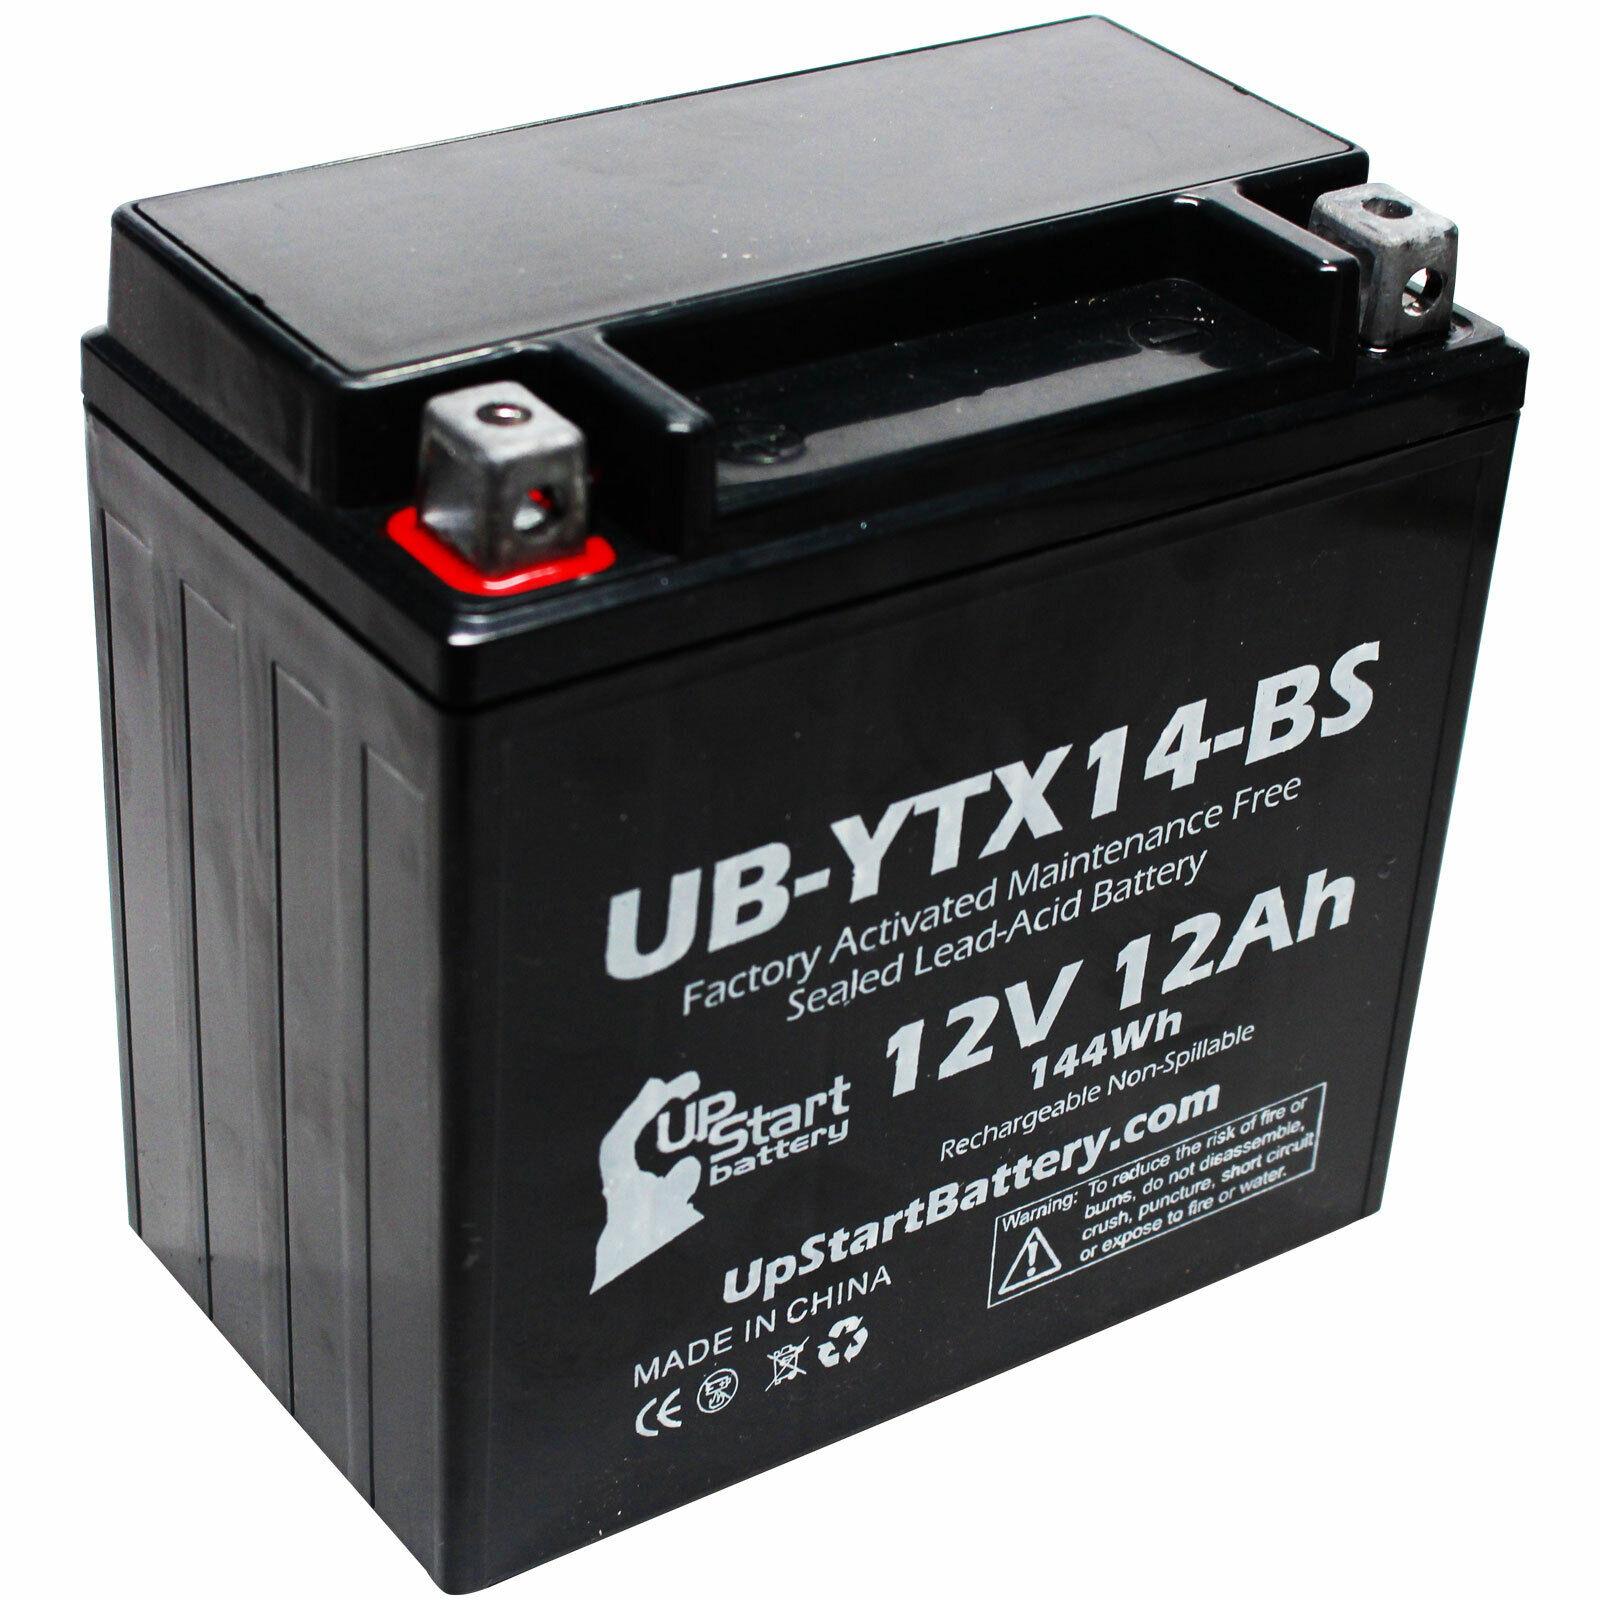 12V 12AH Battery for 2001 Honda TRX450 FourTrax Foreman S, ES 450 CC